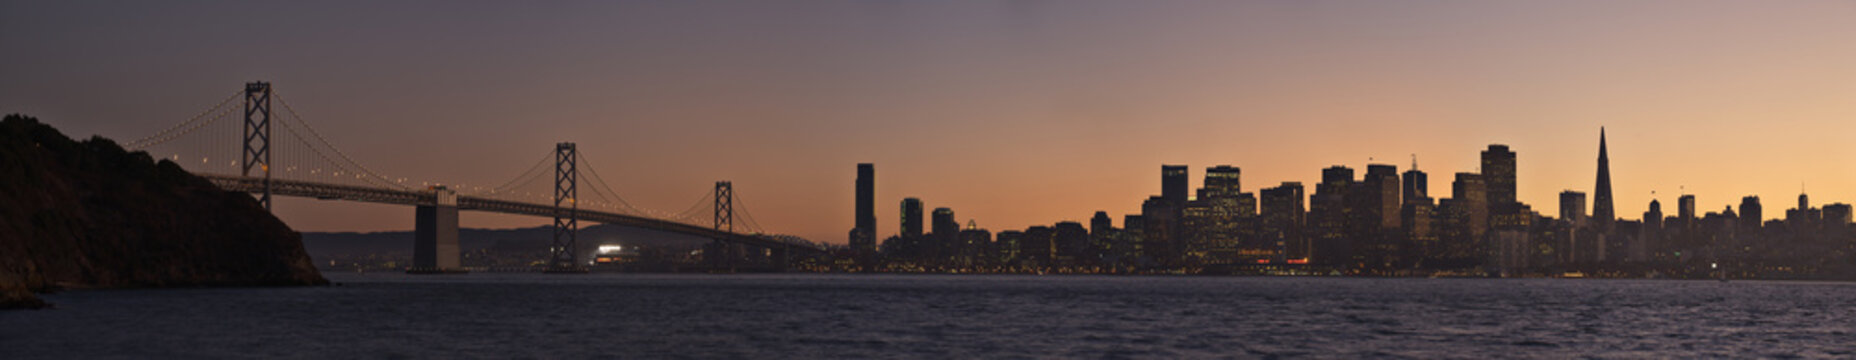 San Francisco panoramic photo